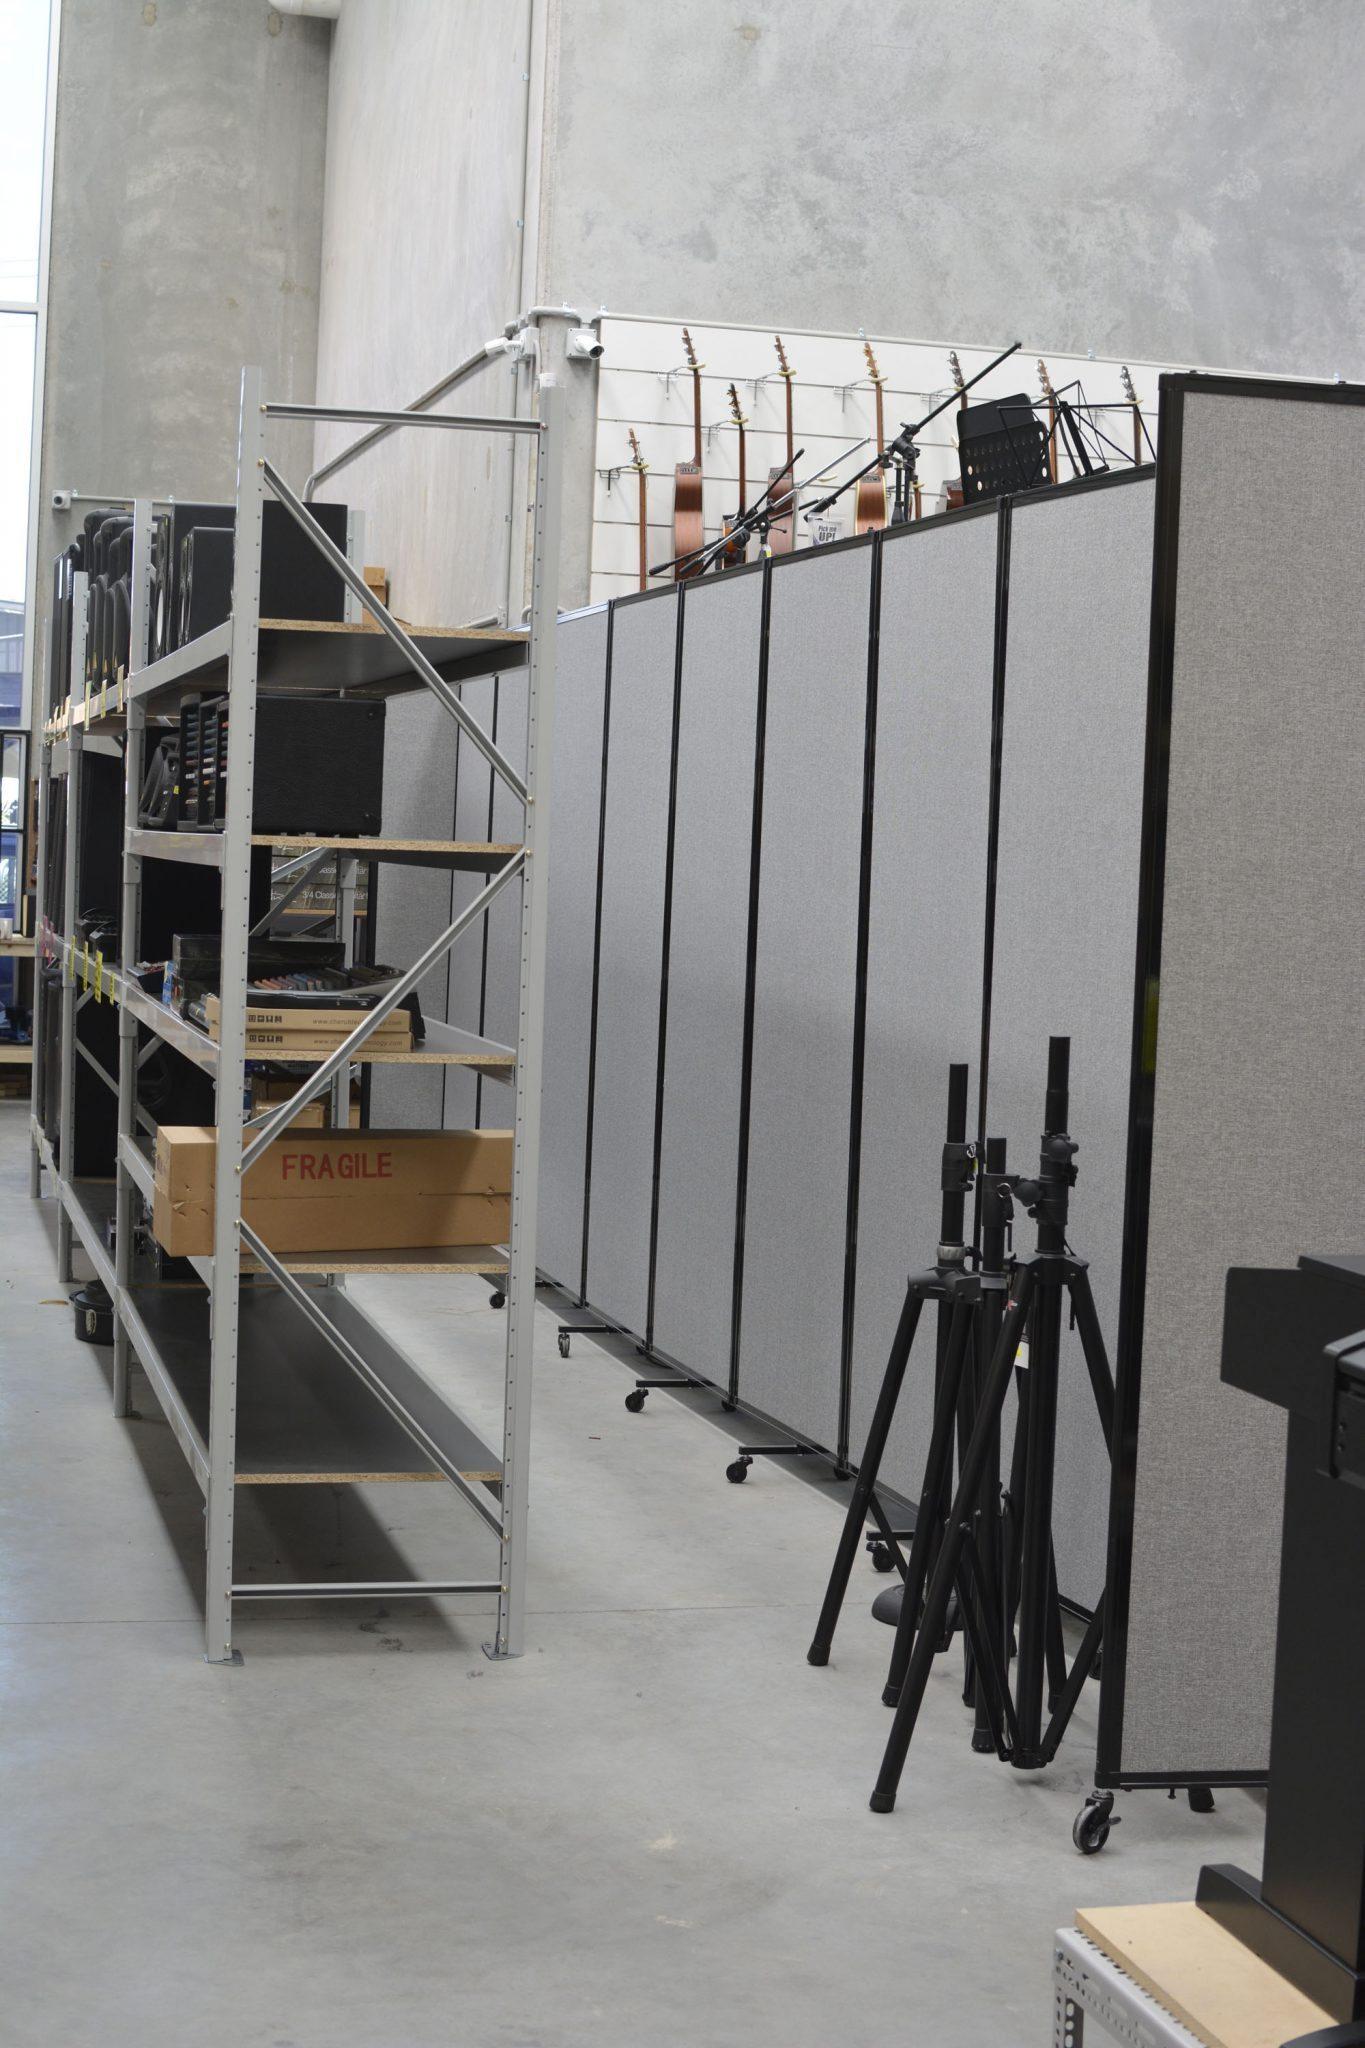 polycarbonate flexible room dividers - Portable Partitions